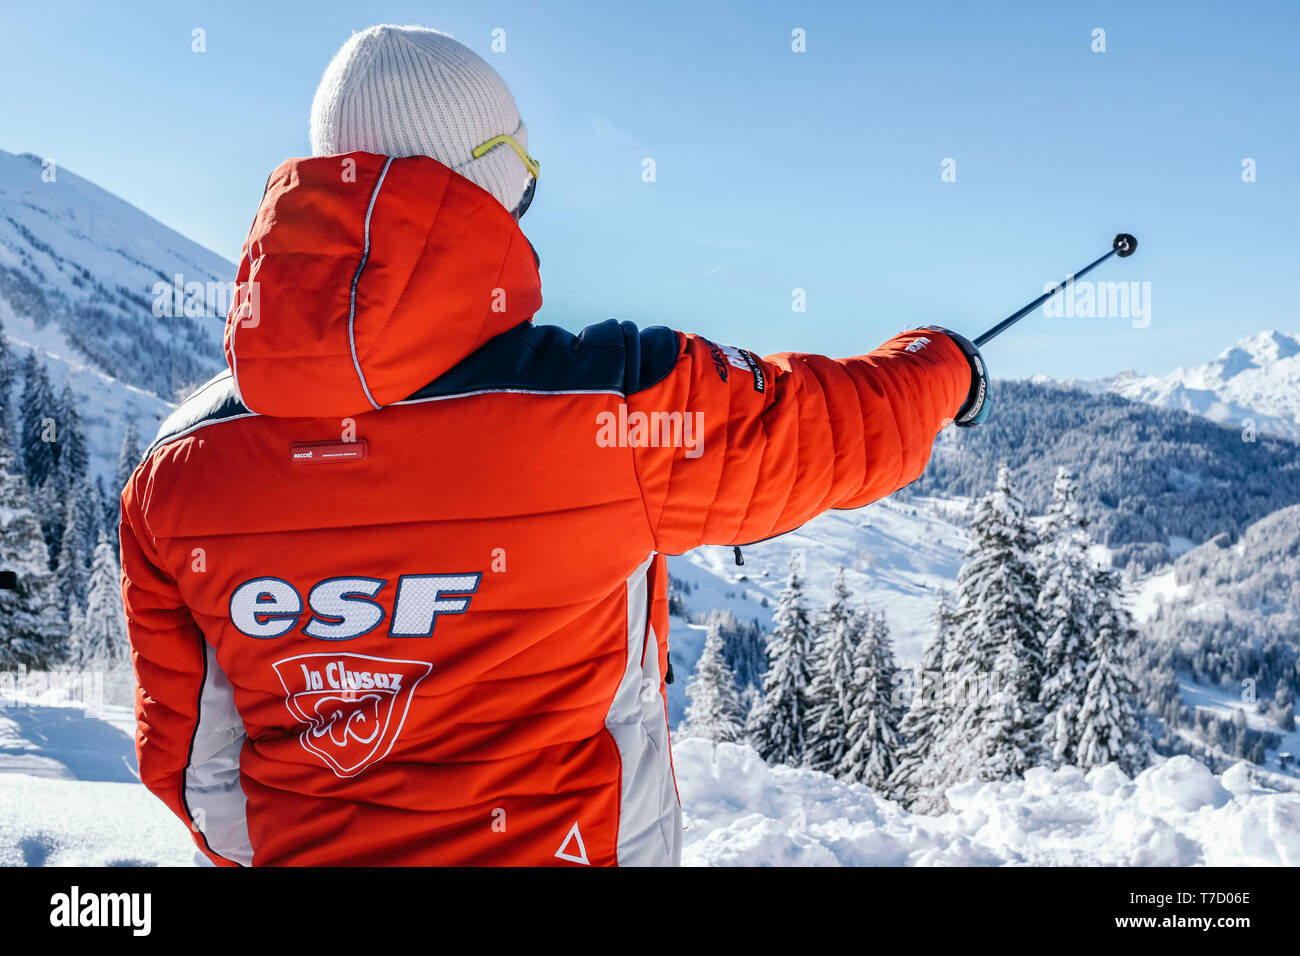 French ski school ESF ski instructor, ski resort of La Clusaz (central-eastern France). Ski instructor pointing out a direction with a ski pole - Stock Image